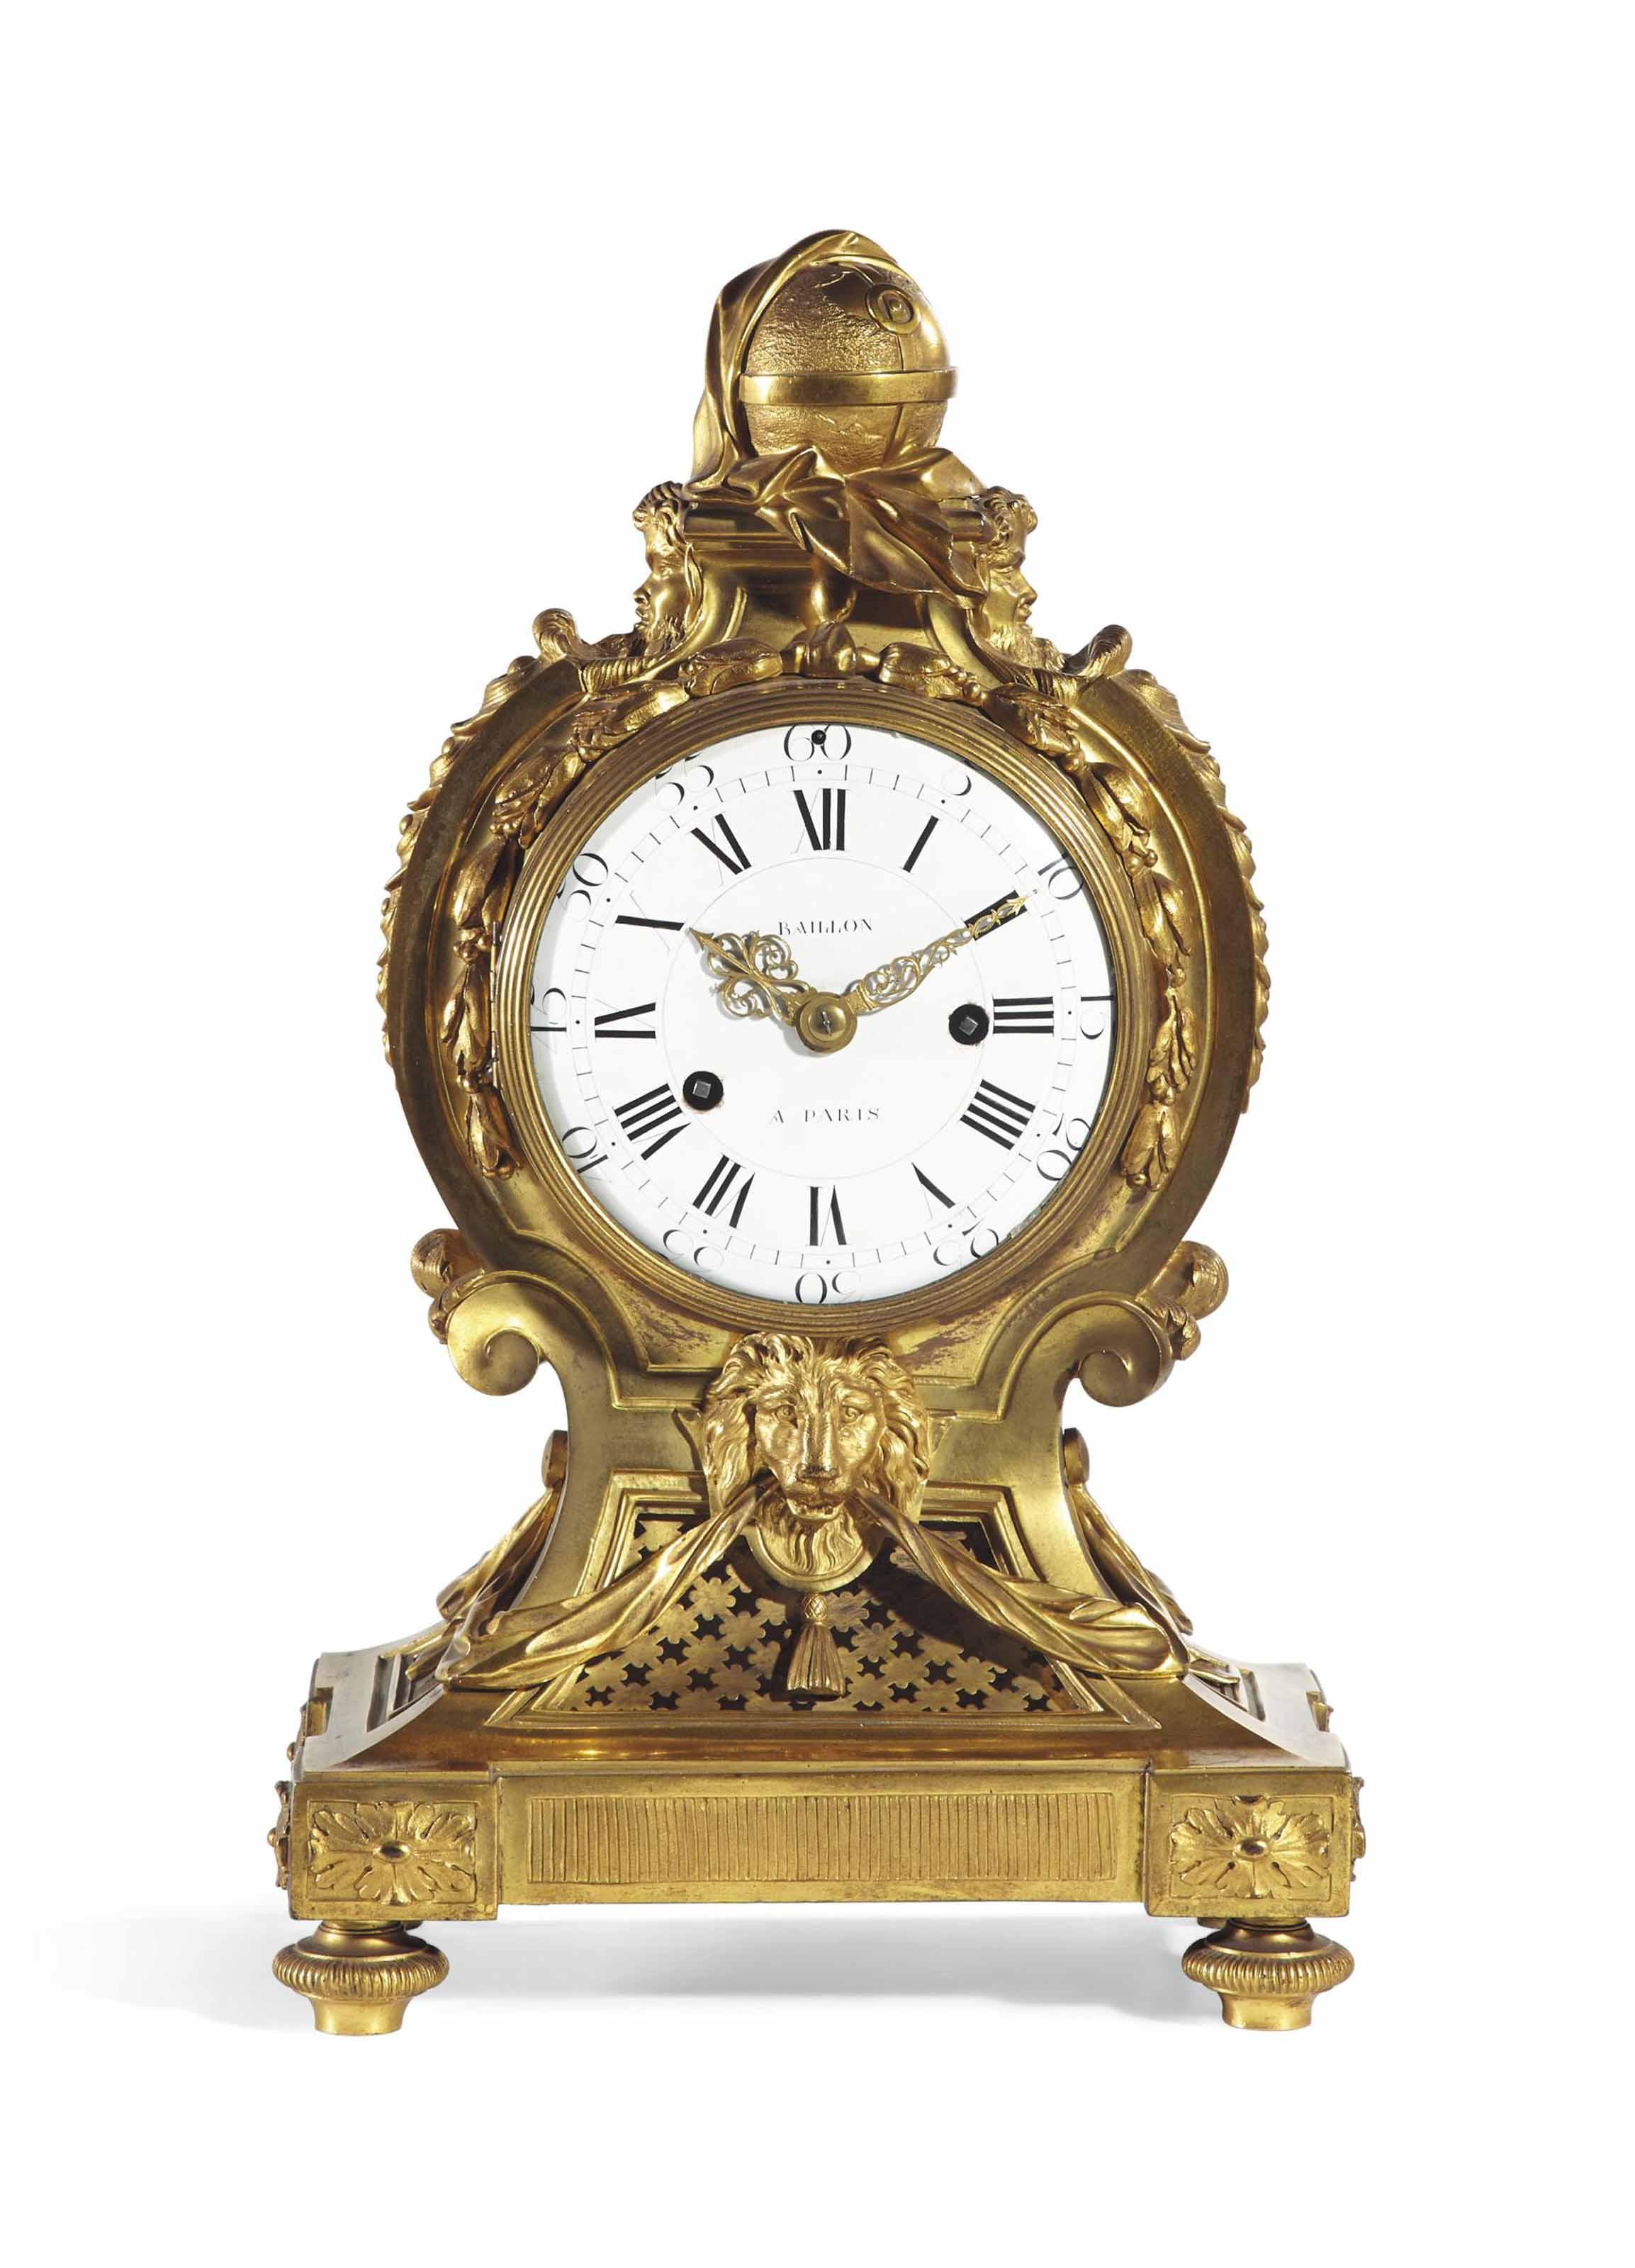 pendule de cartonnier d 39 epoque louis xvi signature de jean baptiste baillon vers 1770. Black Bedroom Furniture Sets. Home Design Ideas